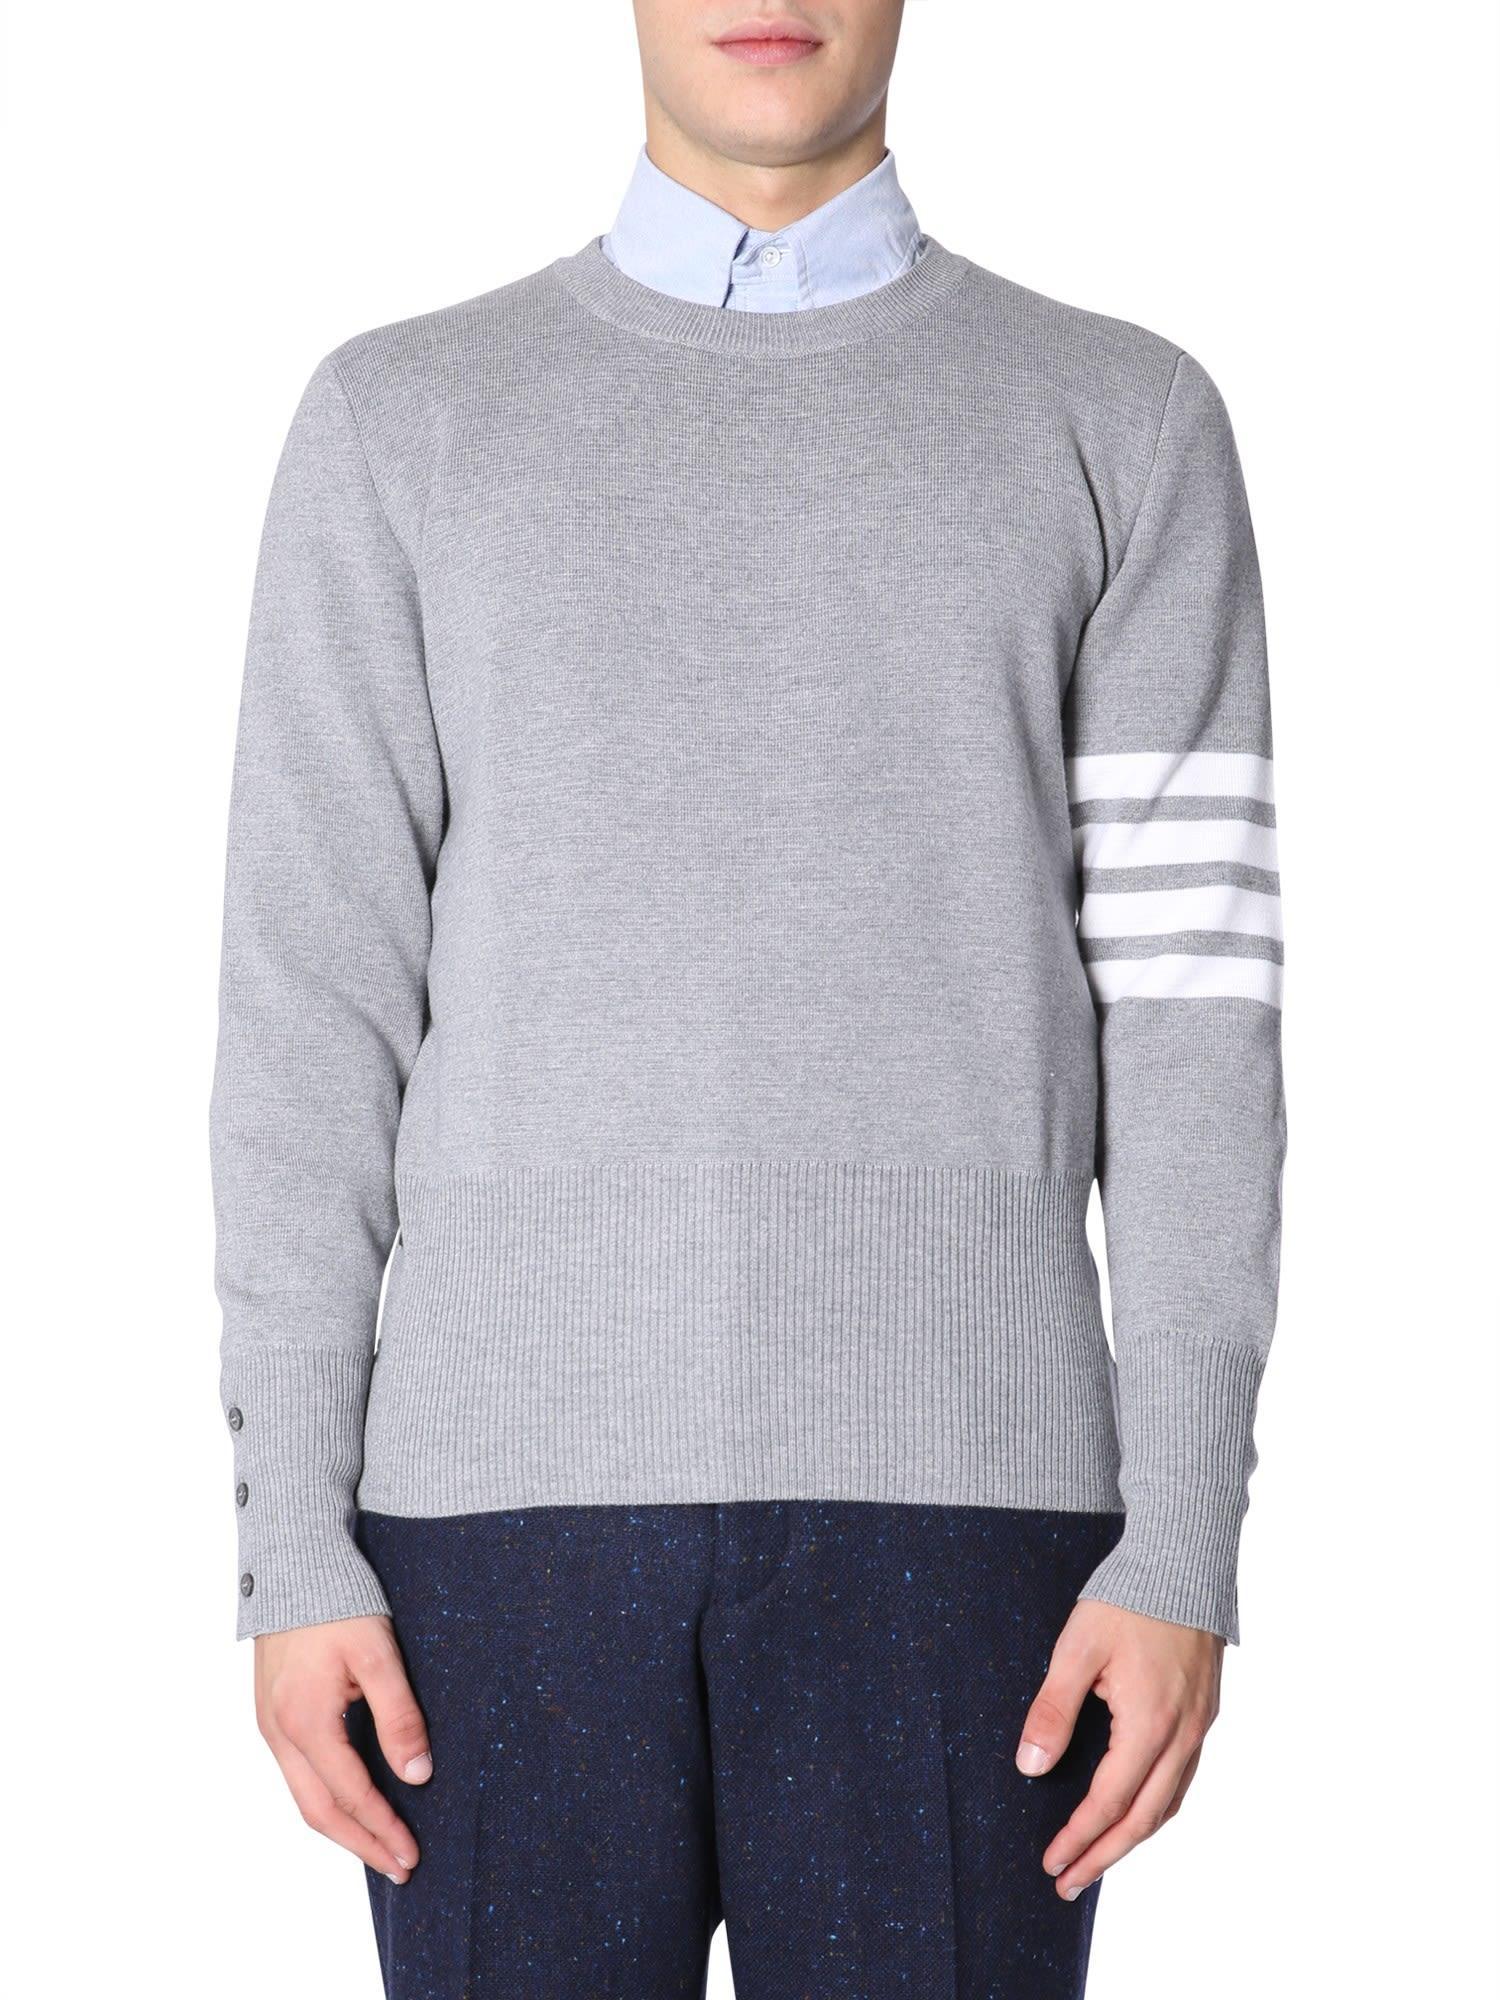 Thom Browne Round Collar Sweater In Grigio